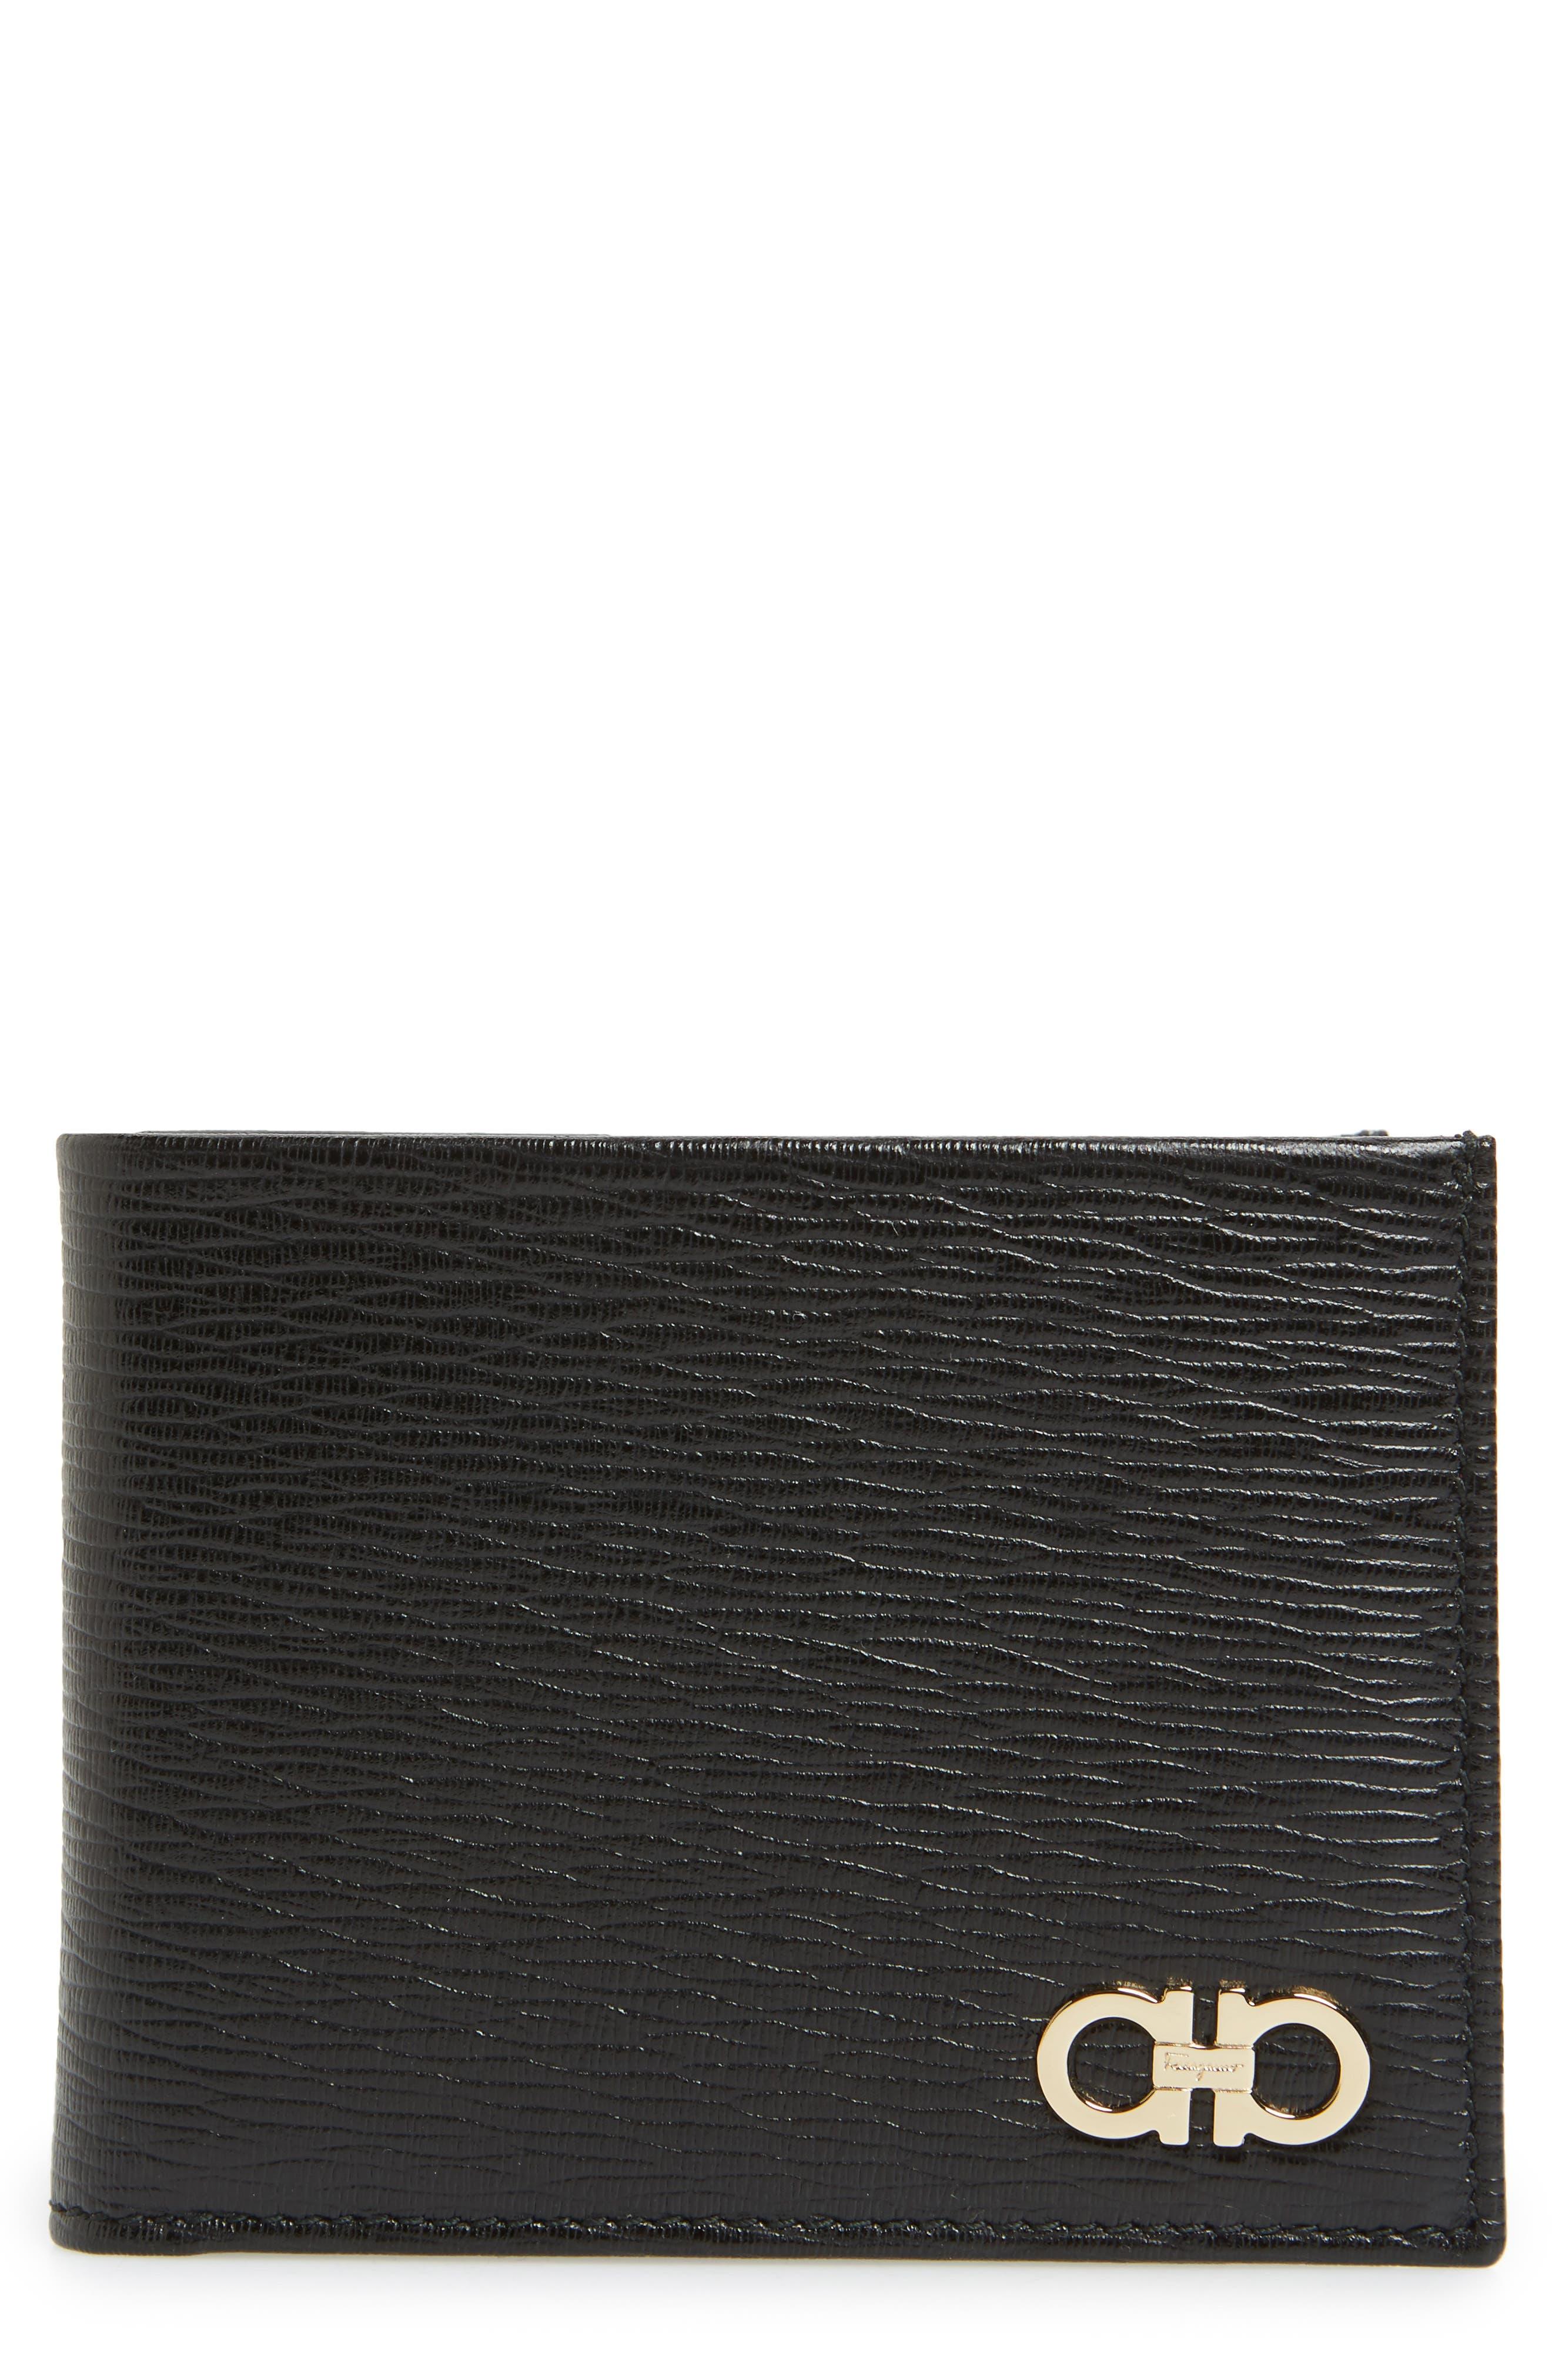 Revival Leather Wallet,                             Main thumbnail 1, color,                             BLACK